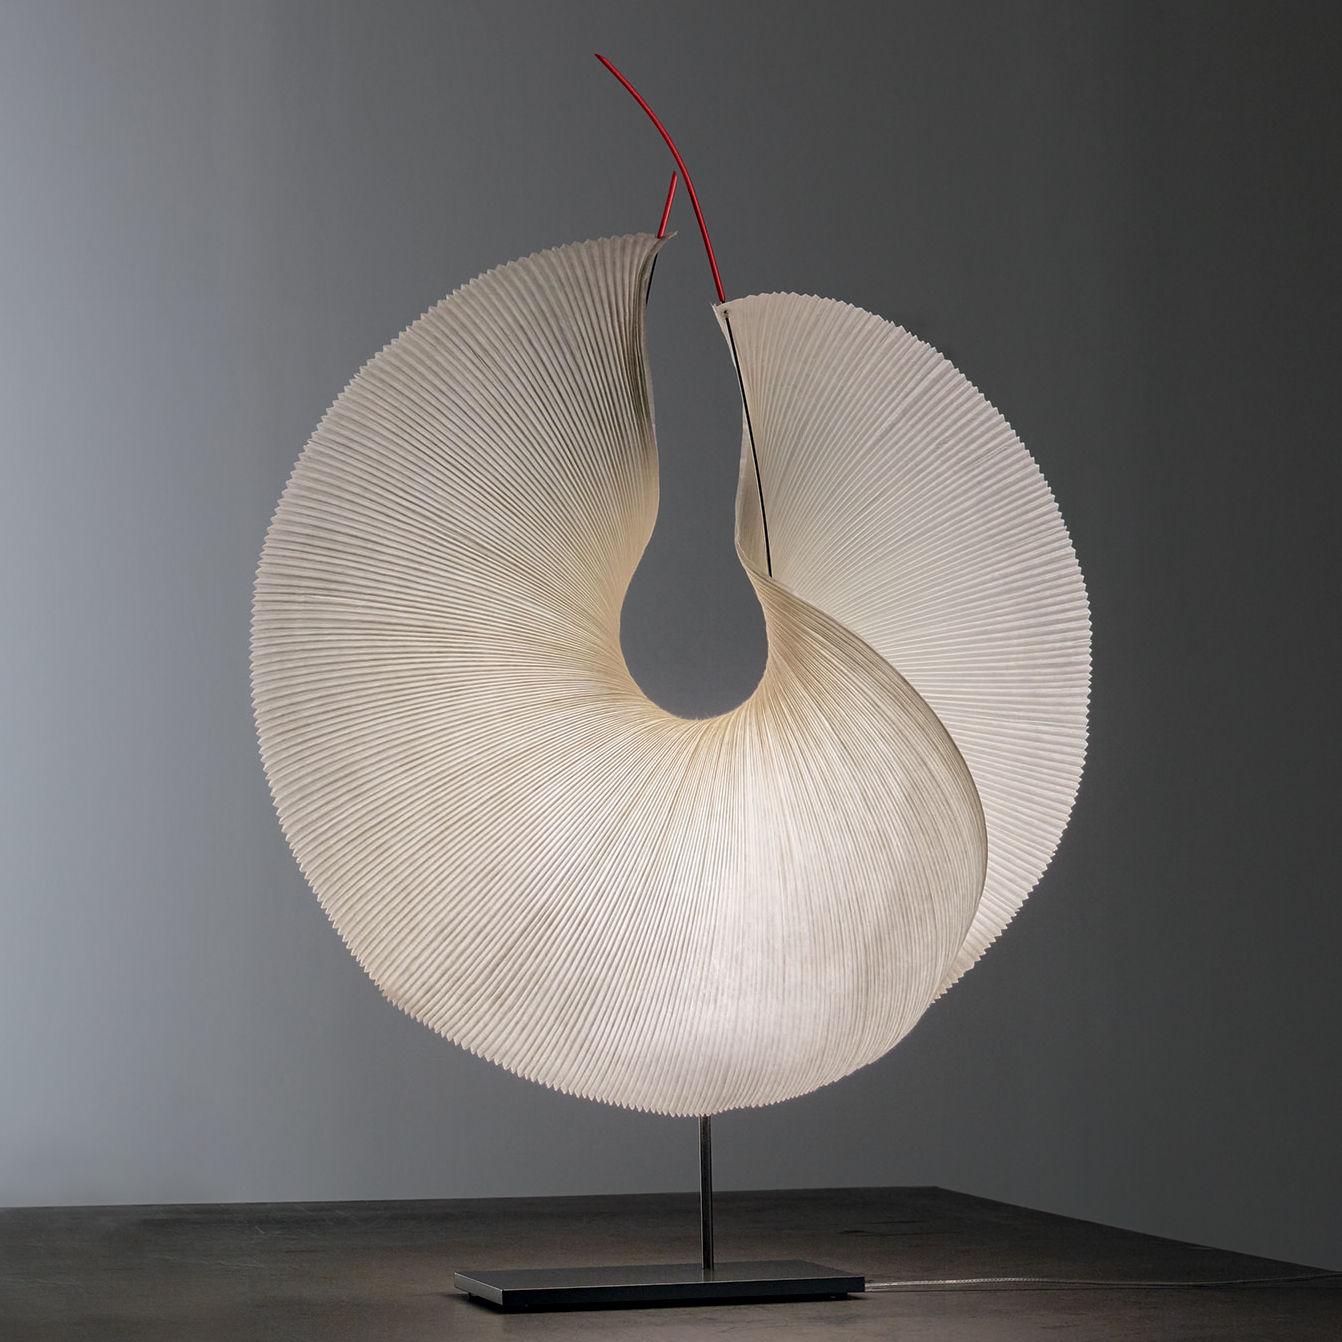 lampe de table the mamo nouchies led yoruba rose beige. Black Bedroom Furniture Sets. Home Design Ideas